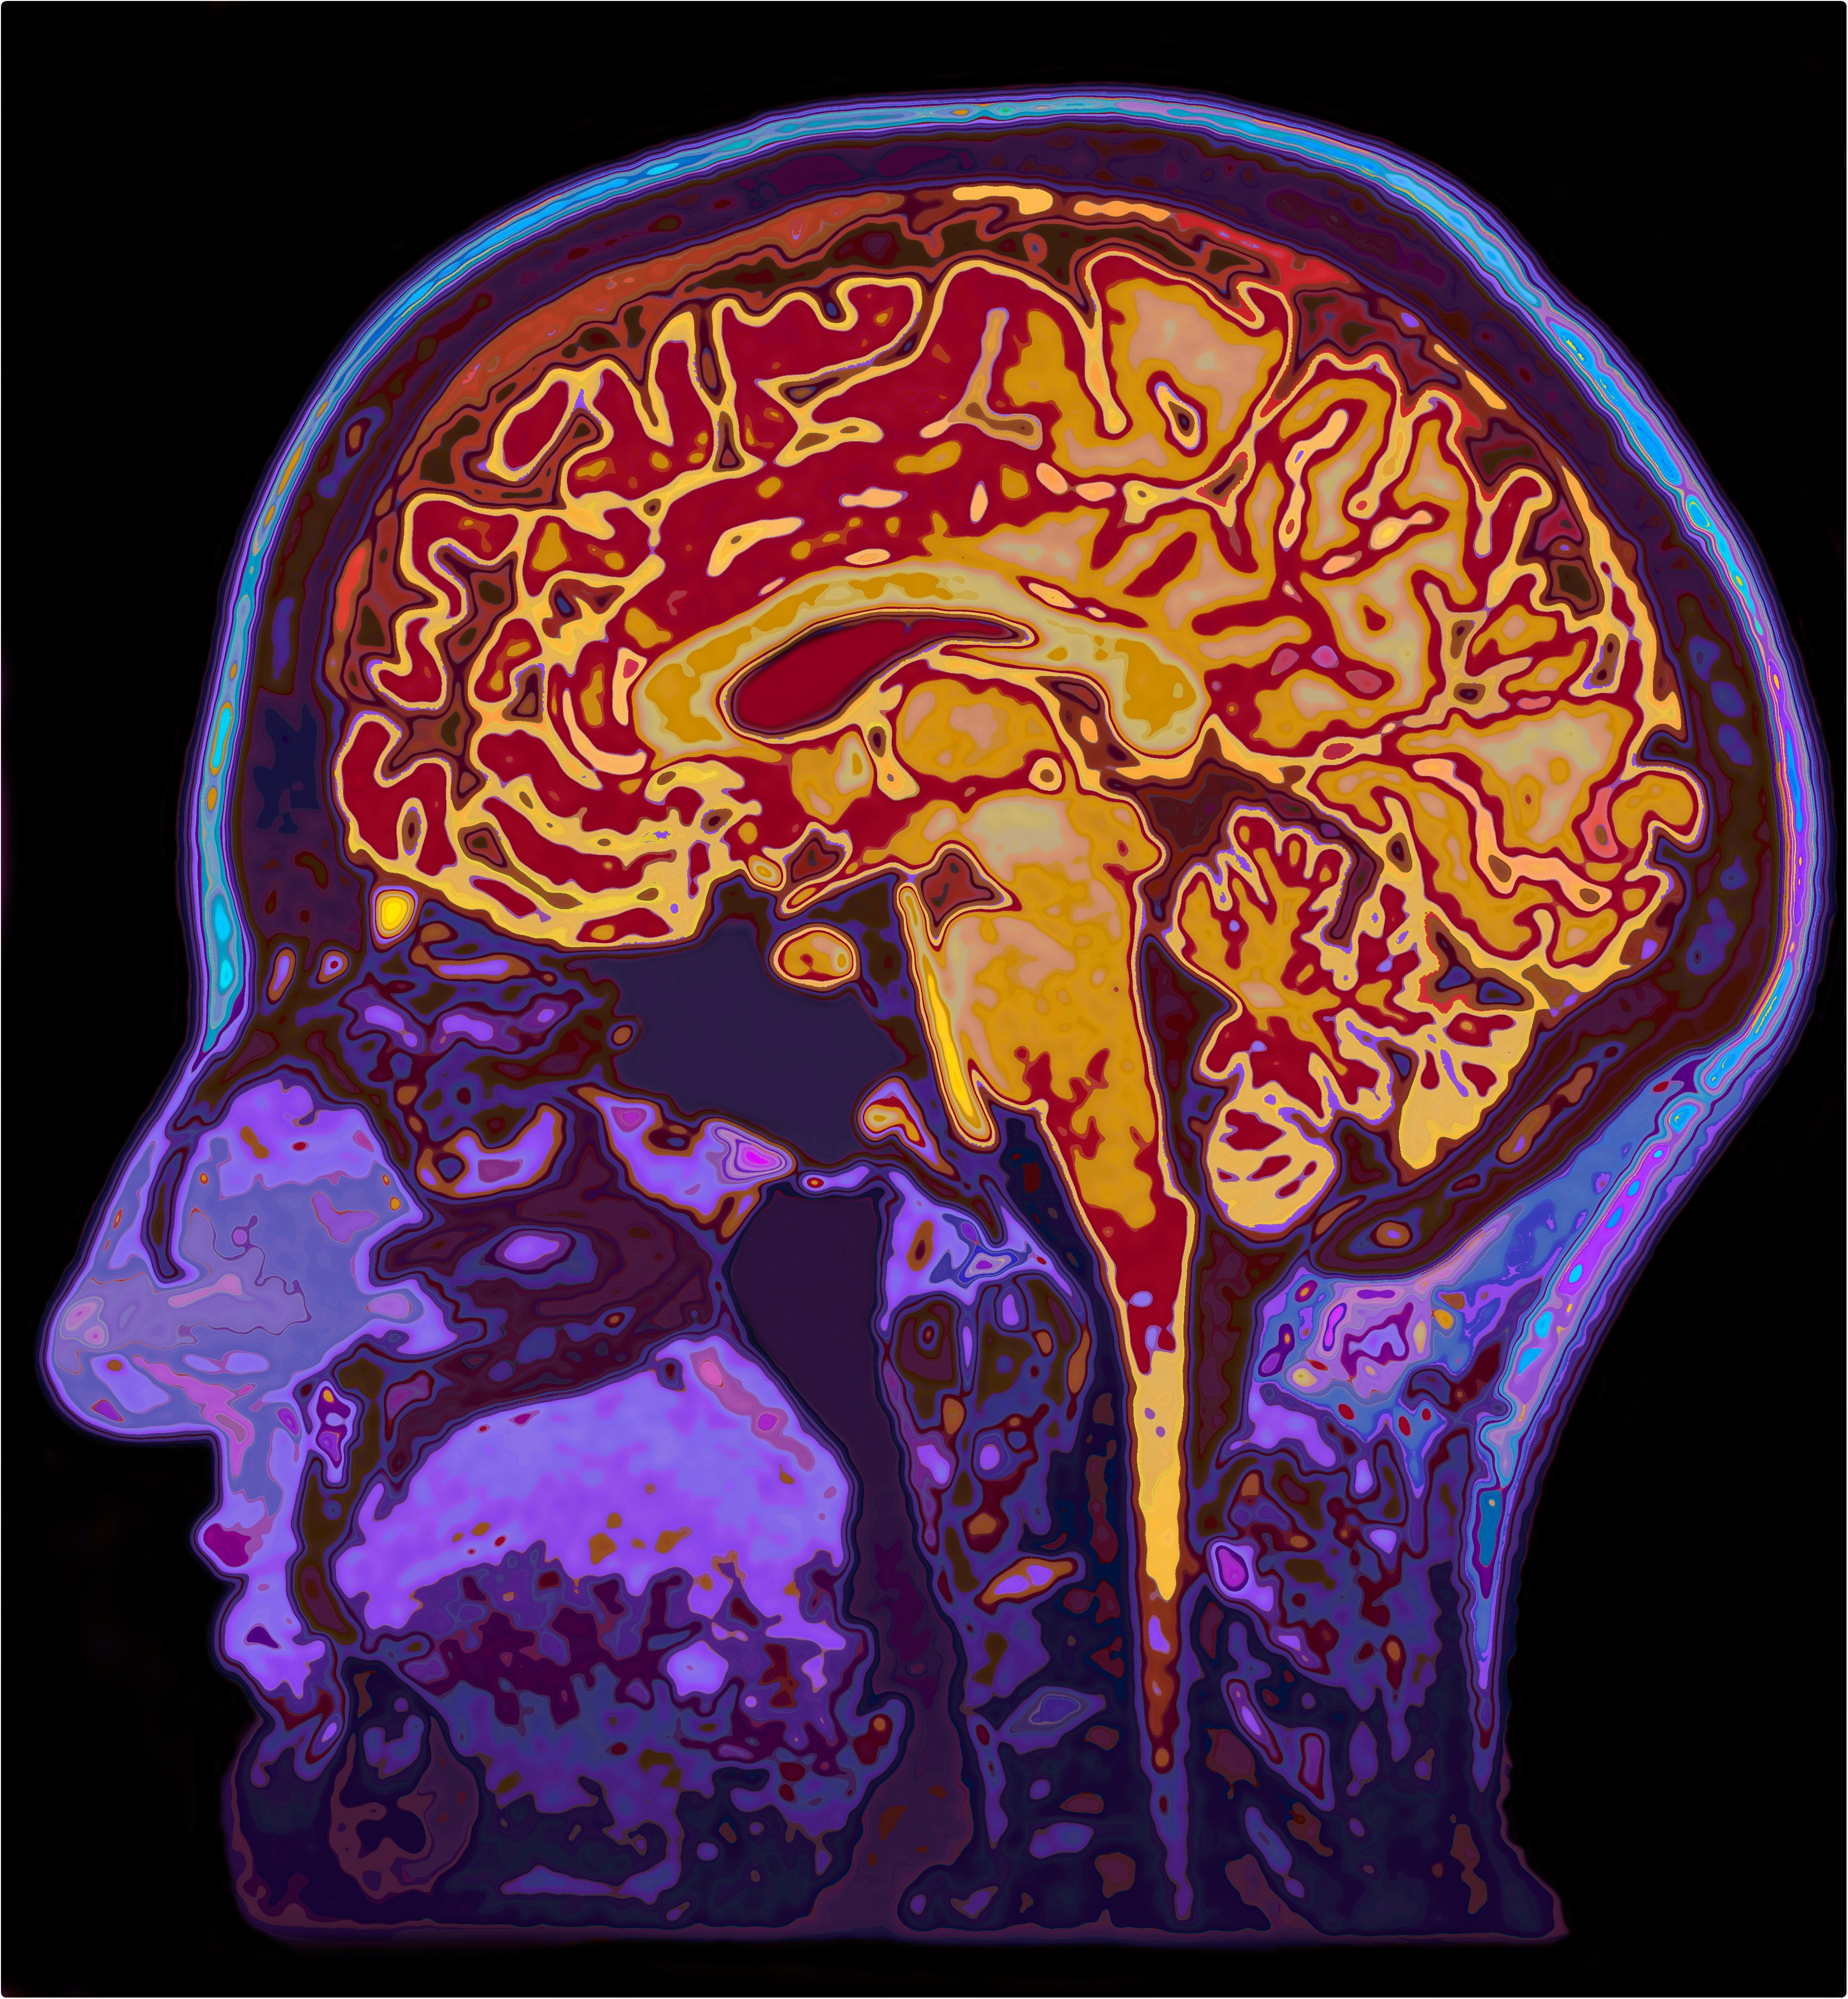 MRI Image of the human brain. Image Credit: SpeedKingz / Shutterstock